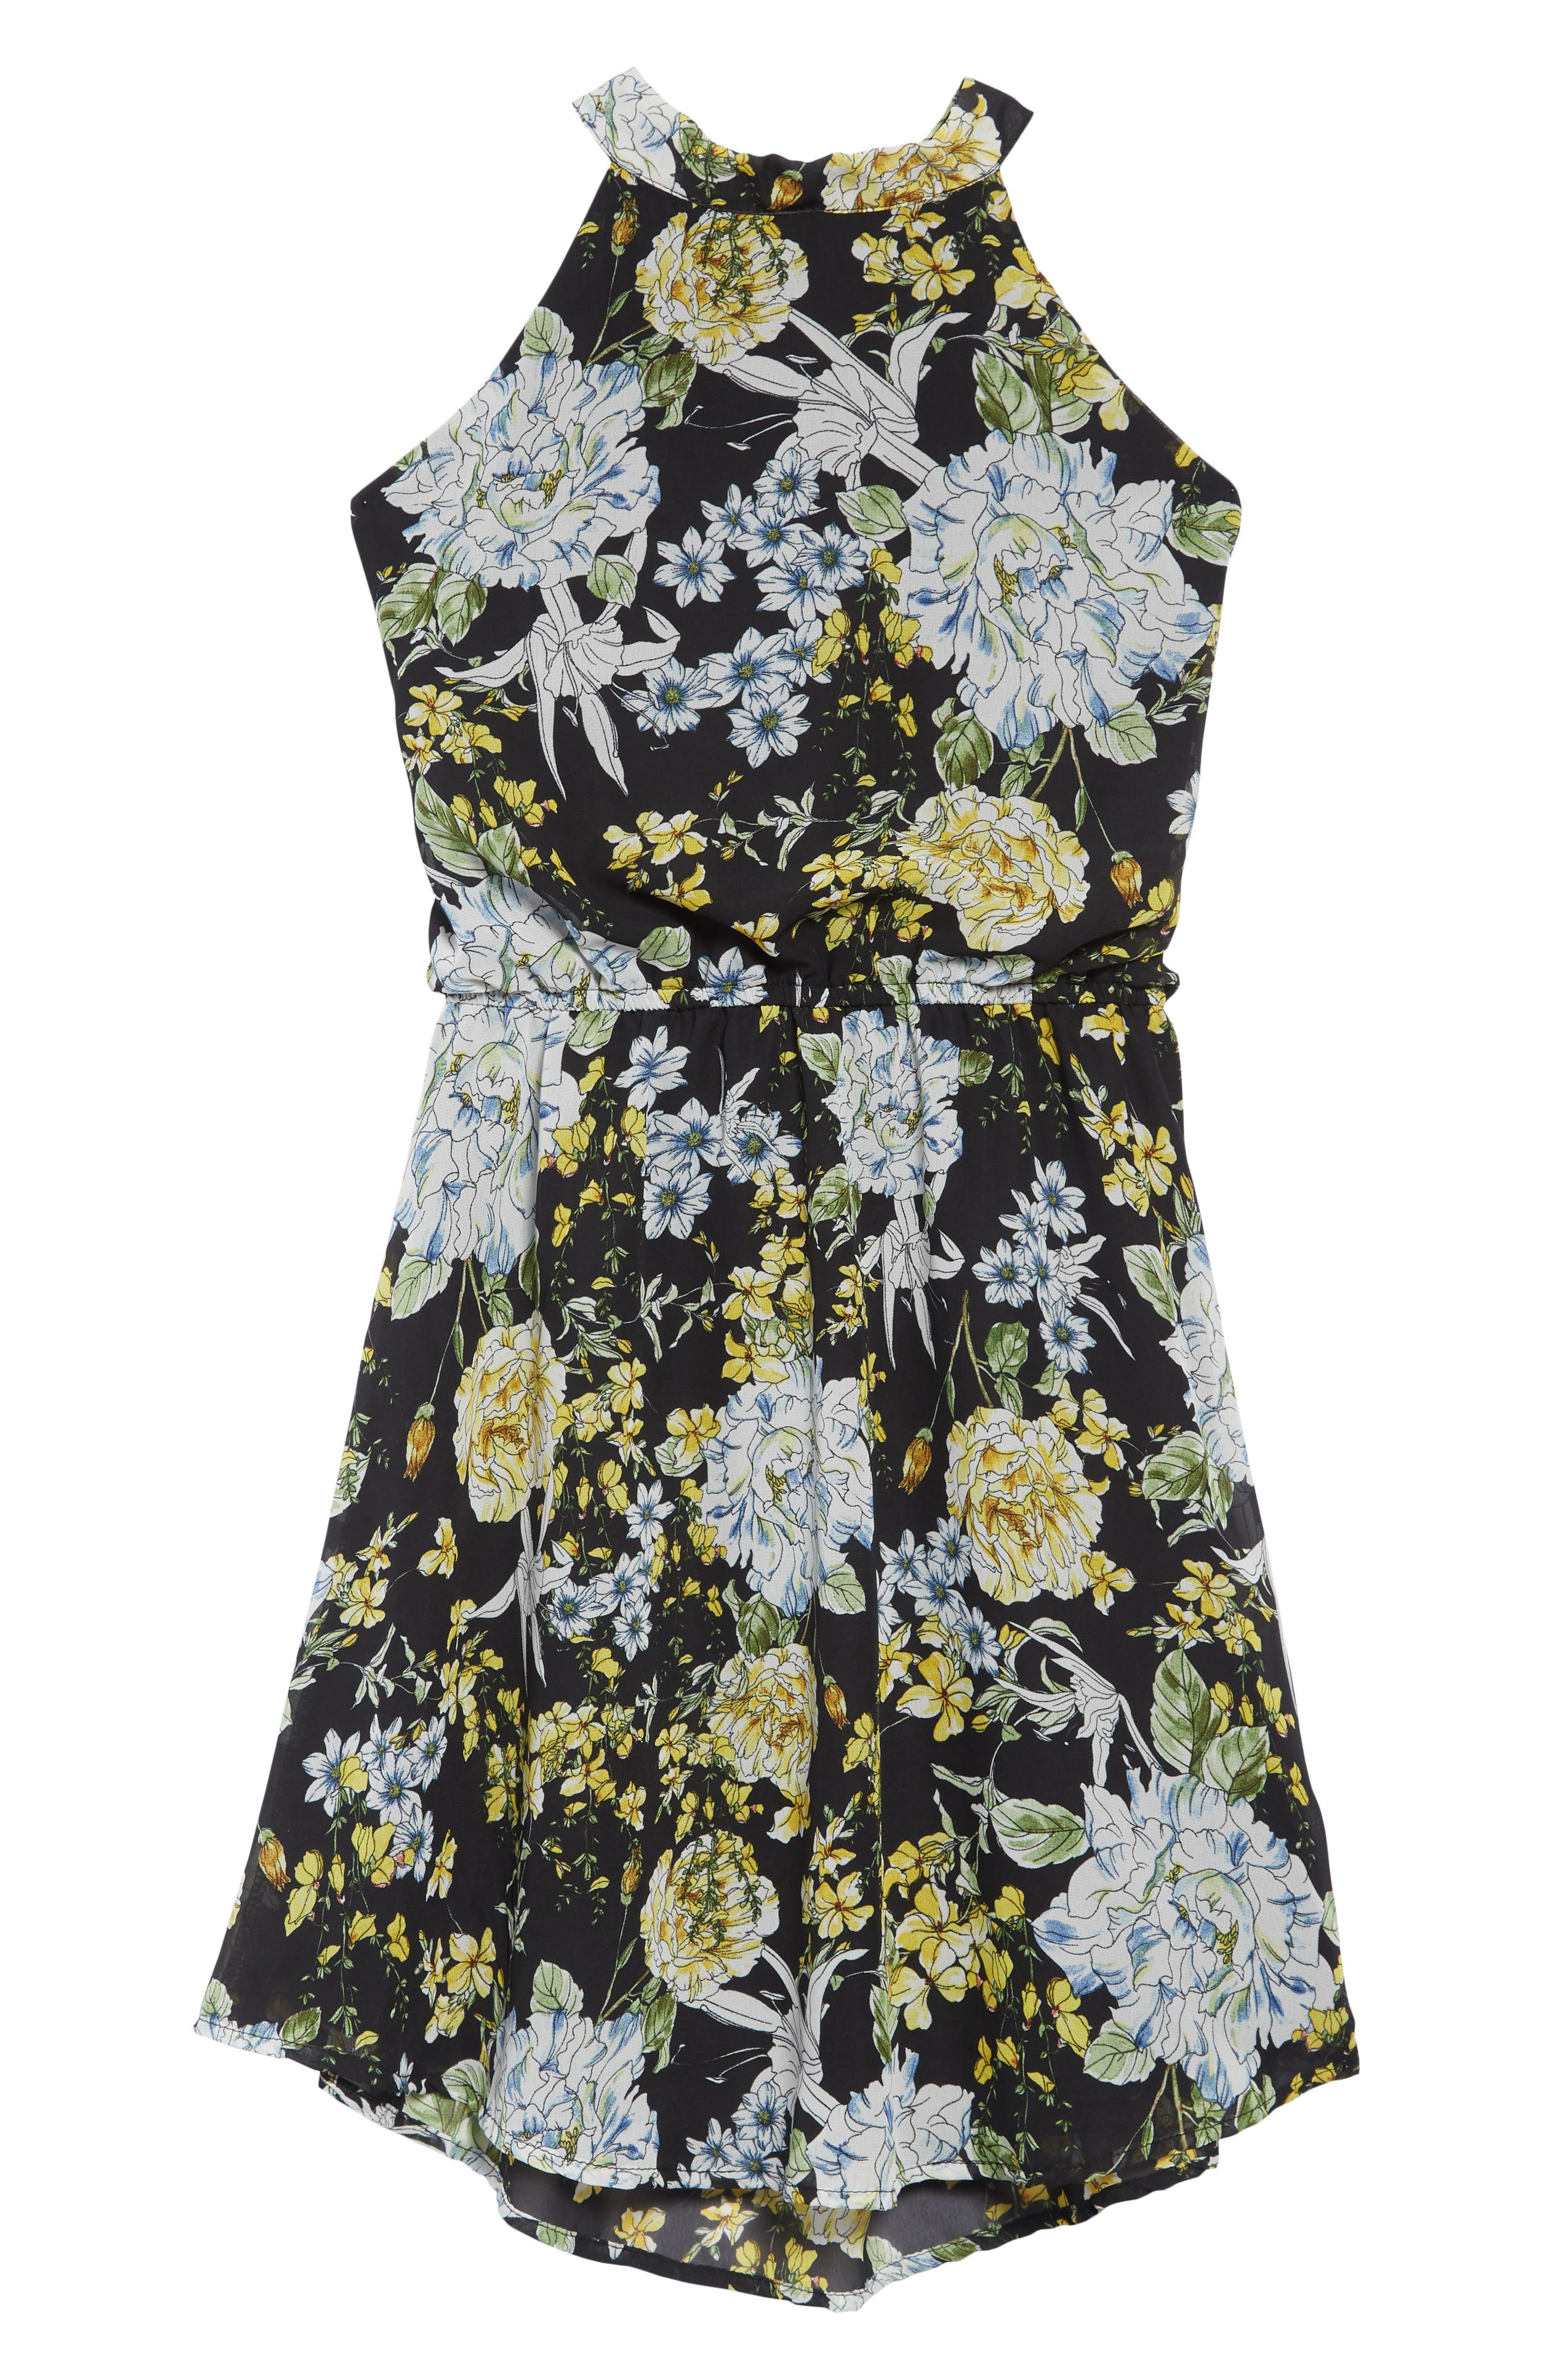 Ava Amp Yelly Girls Dresses